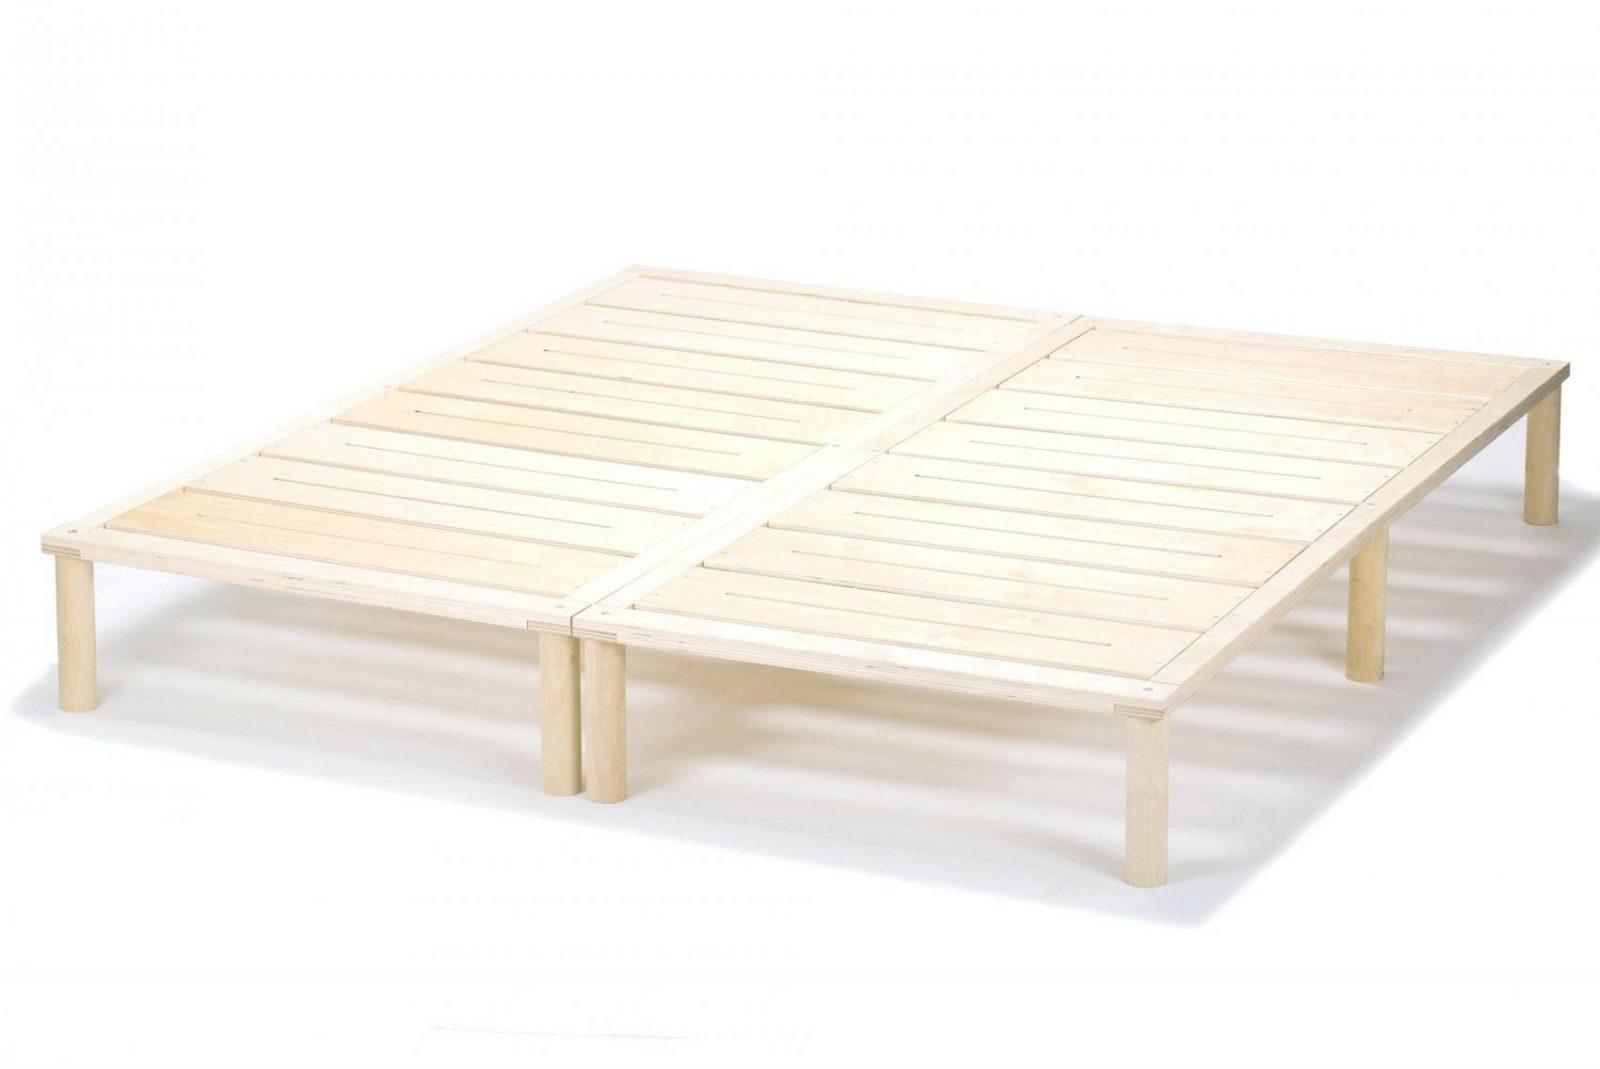 Ausziehbett Gleiche Hohe Holz Flexa Ikea Hemnes – Lavwcd von Ausziehbett Gleiche Höhe Ikea Bild